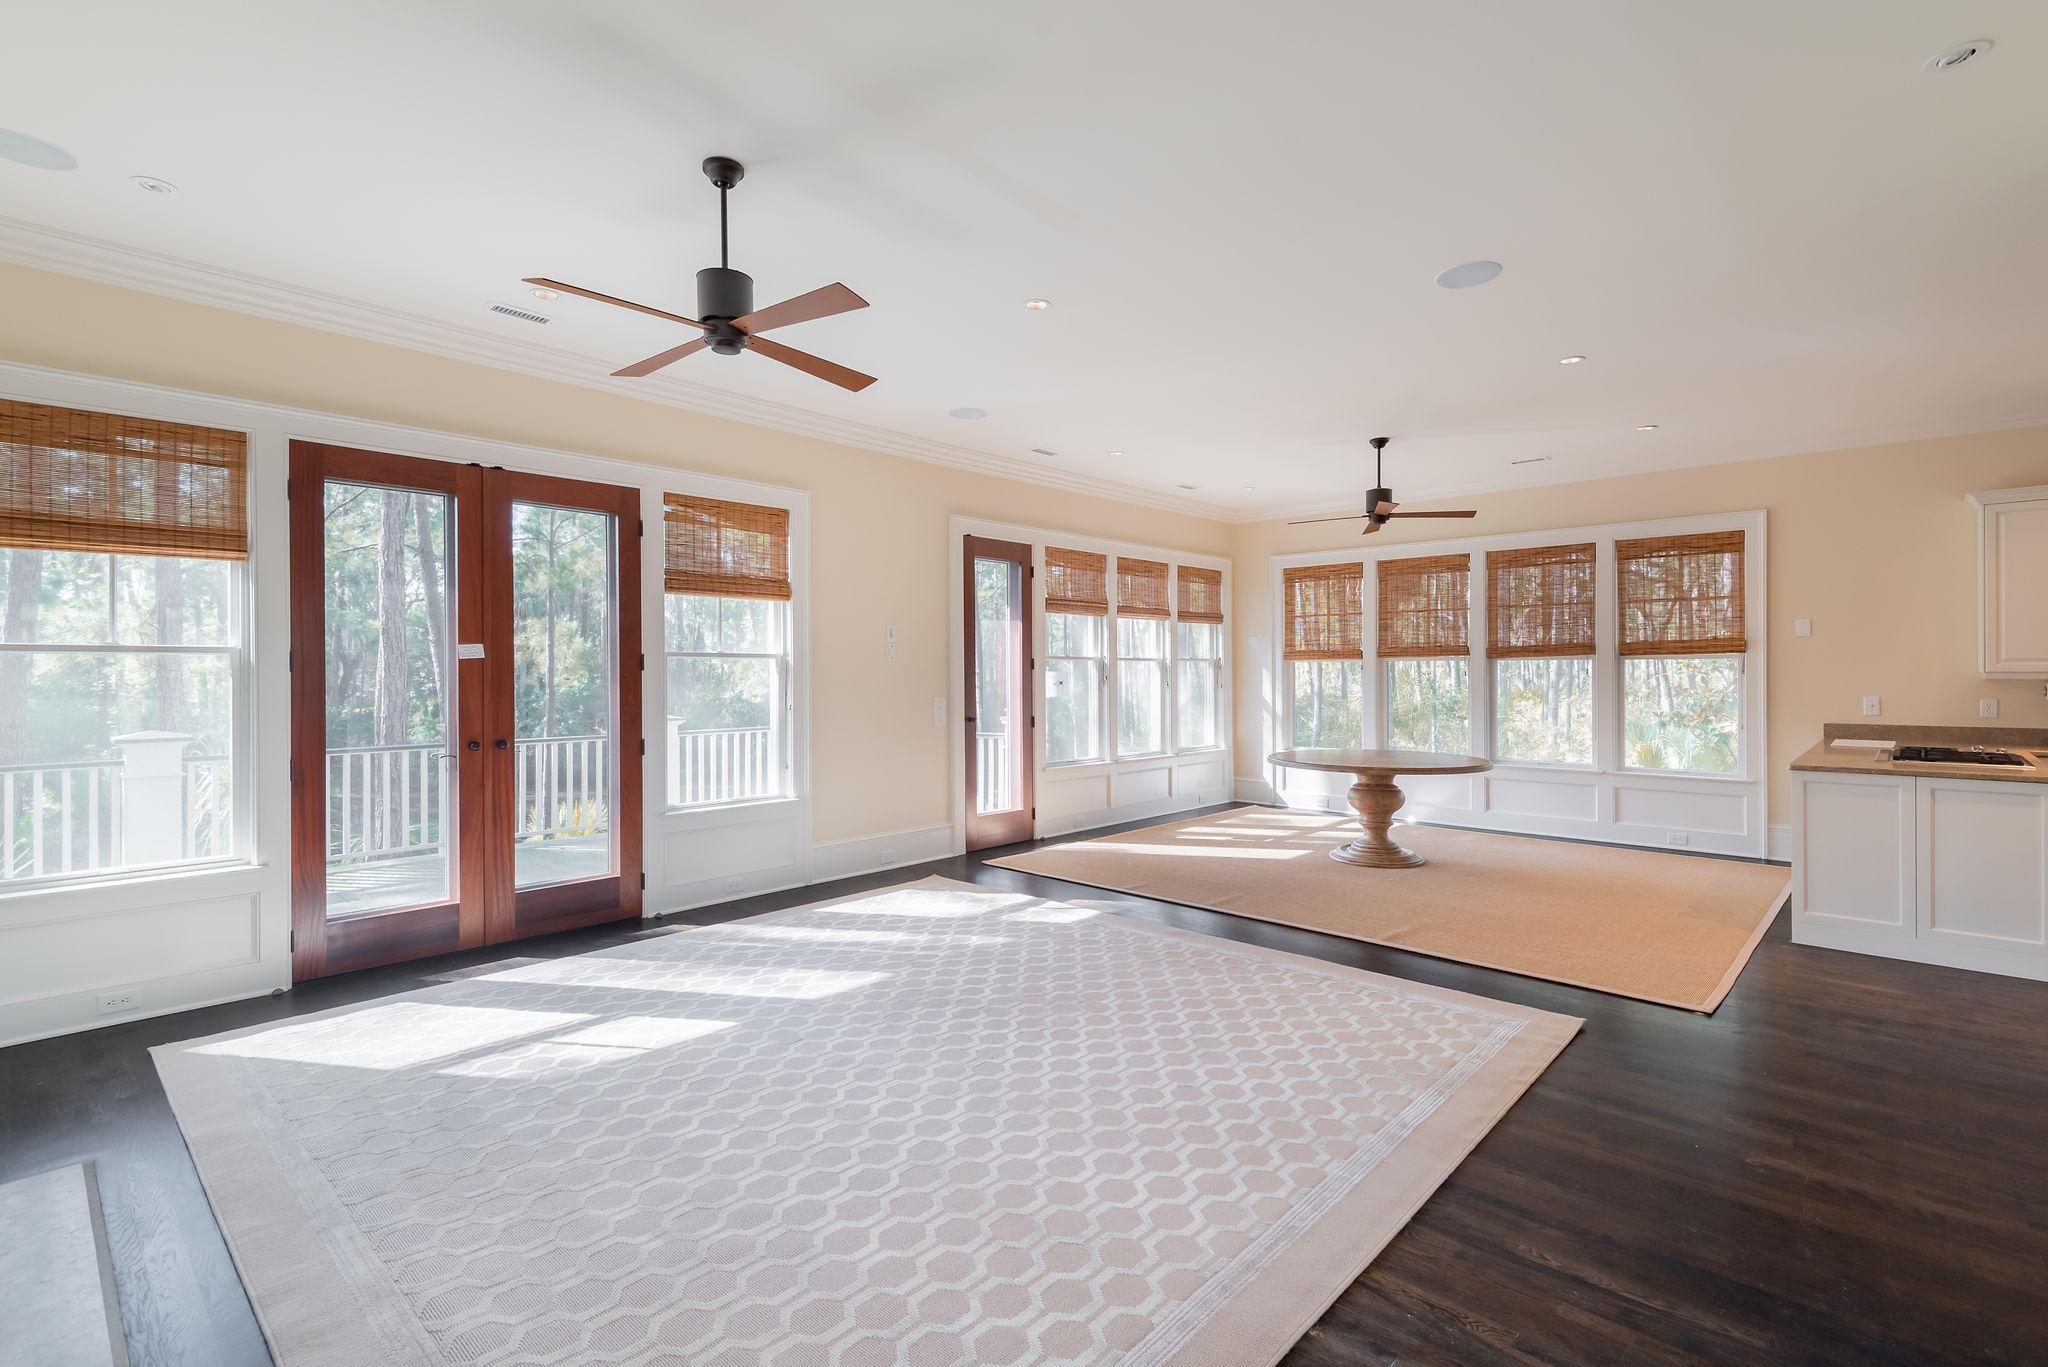 Kiawah Island Homes For Sale - 3 Grey Widgeon, Kiawah Island, SC - 63